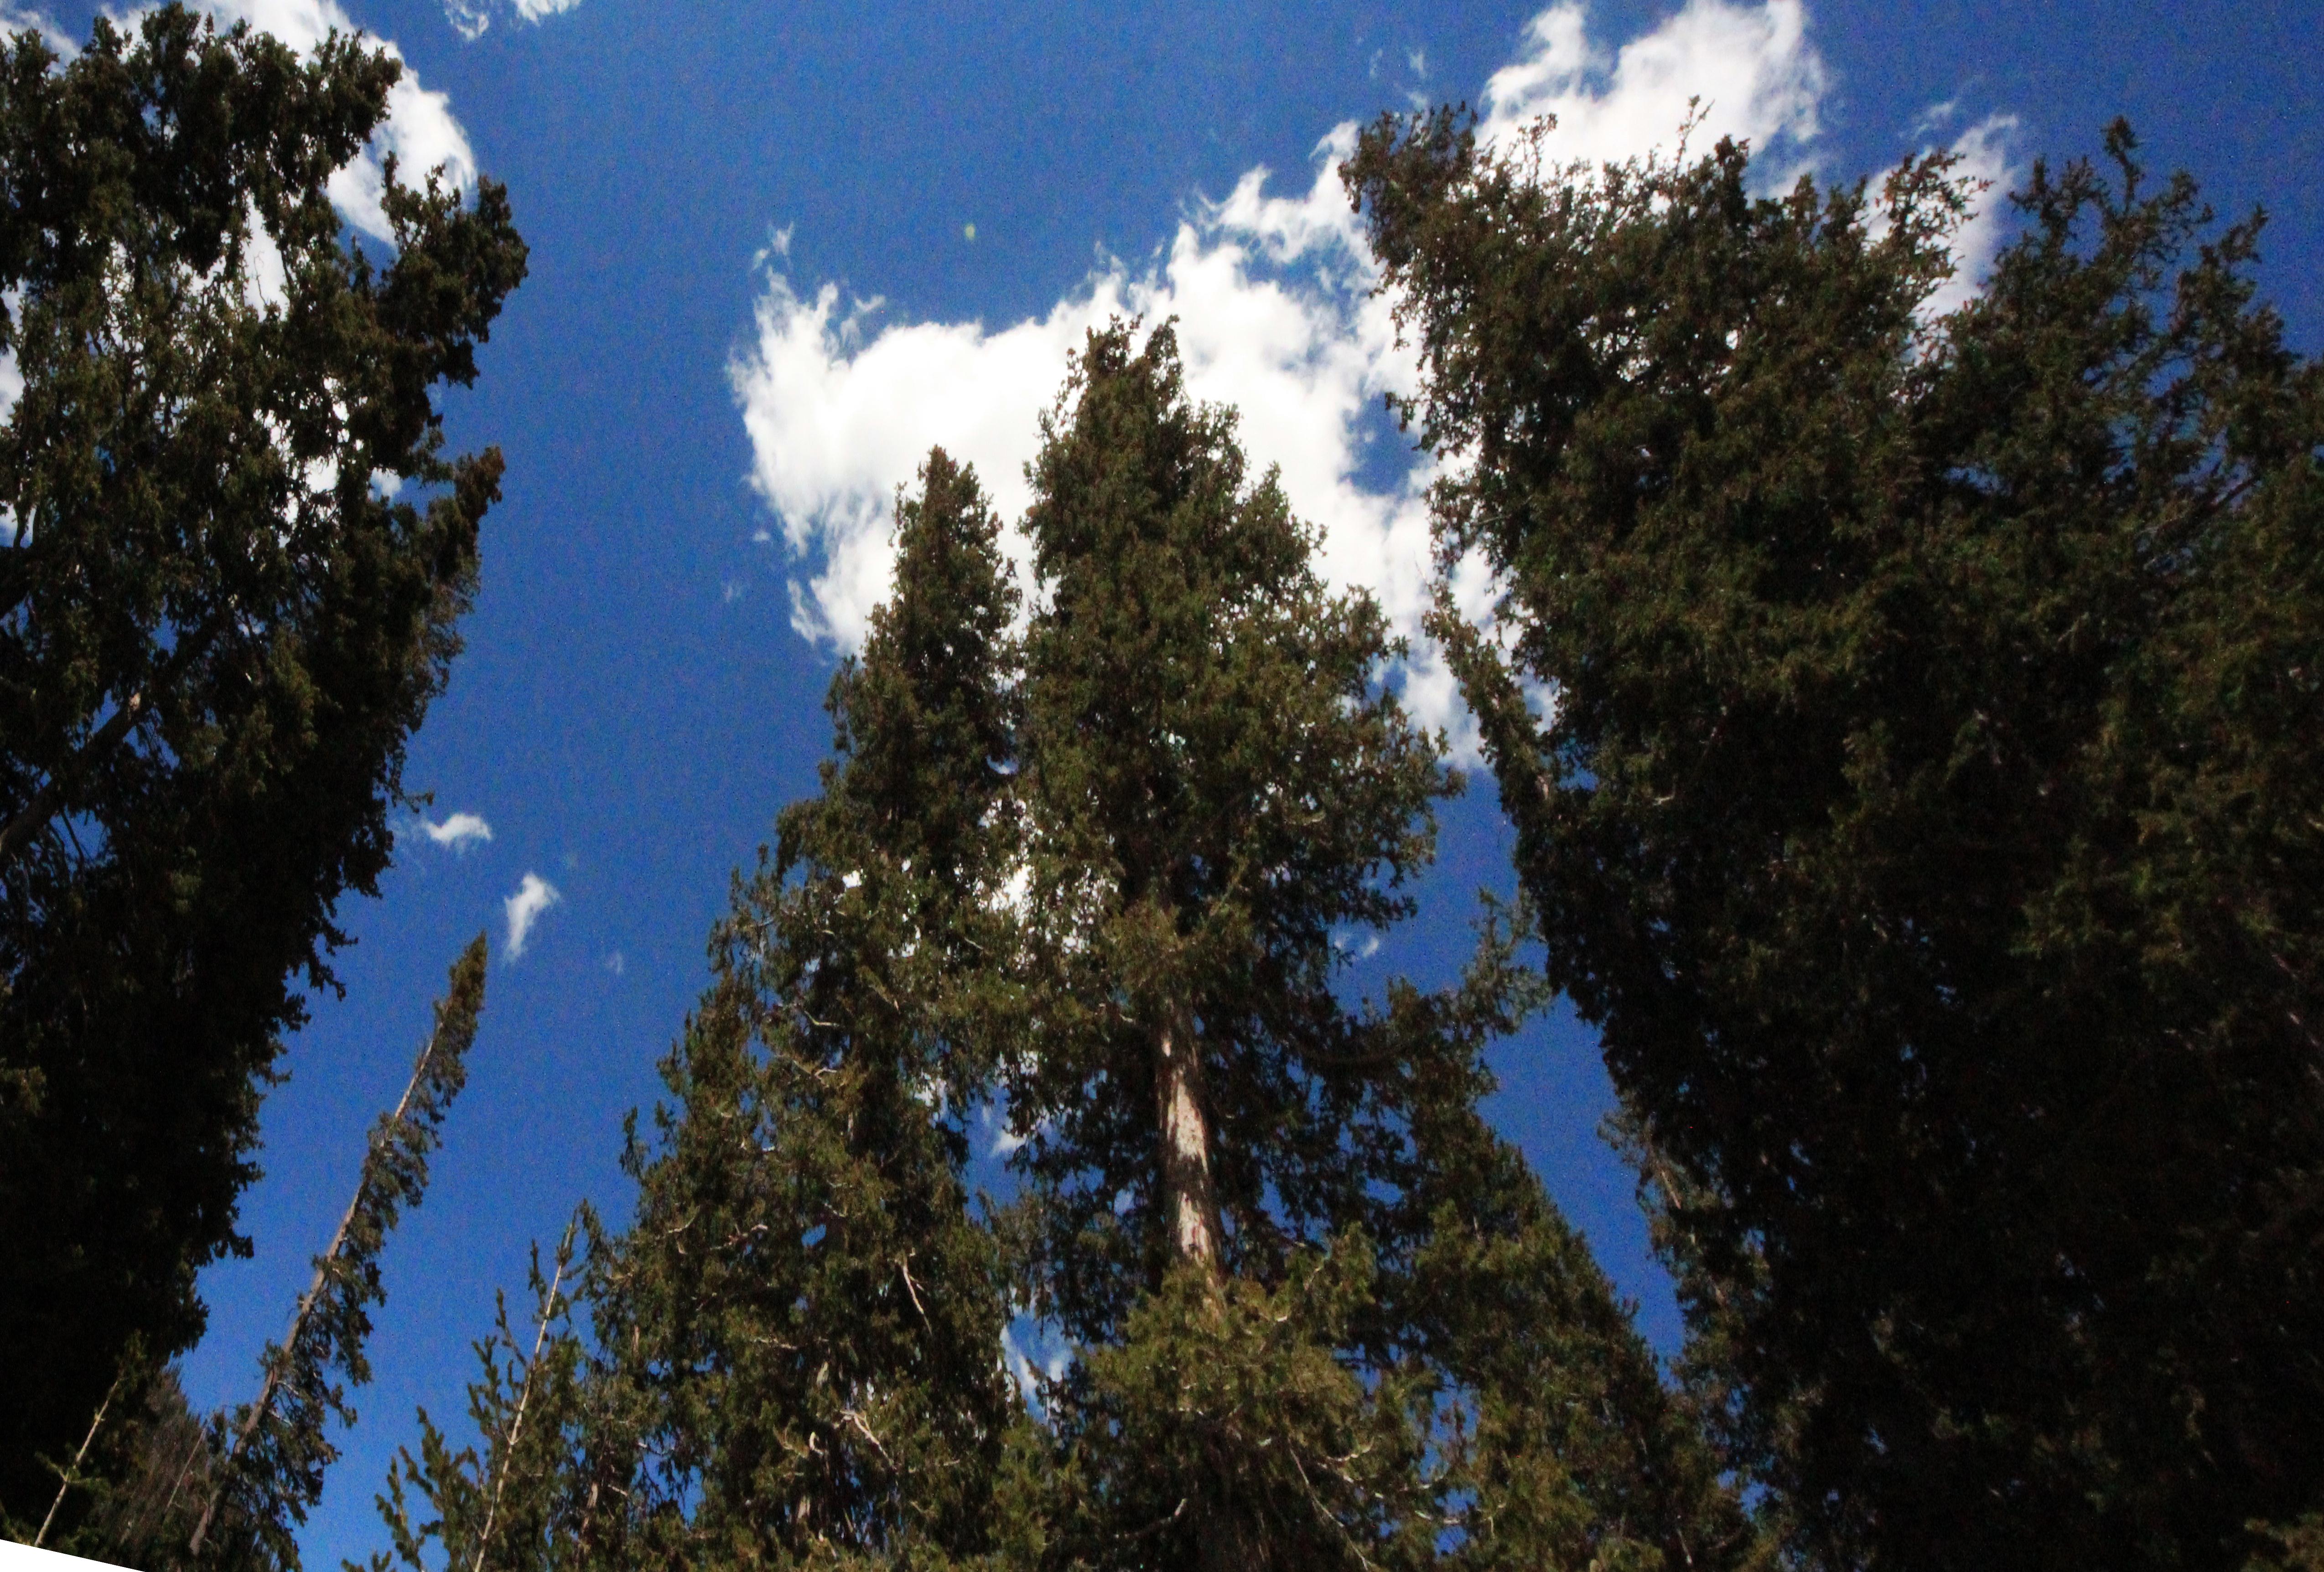 Colrado-Rocky Mtn Natl ParkTREES PERSPECTINE HIGH RES